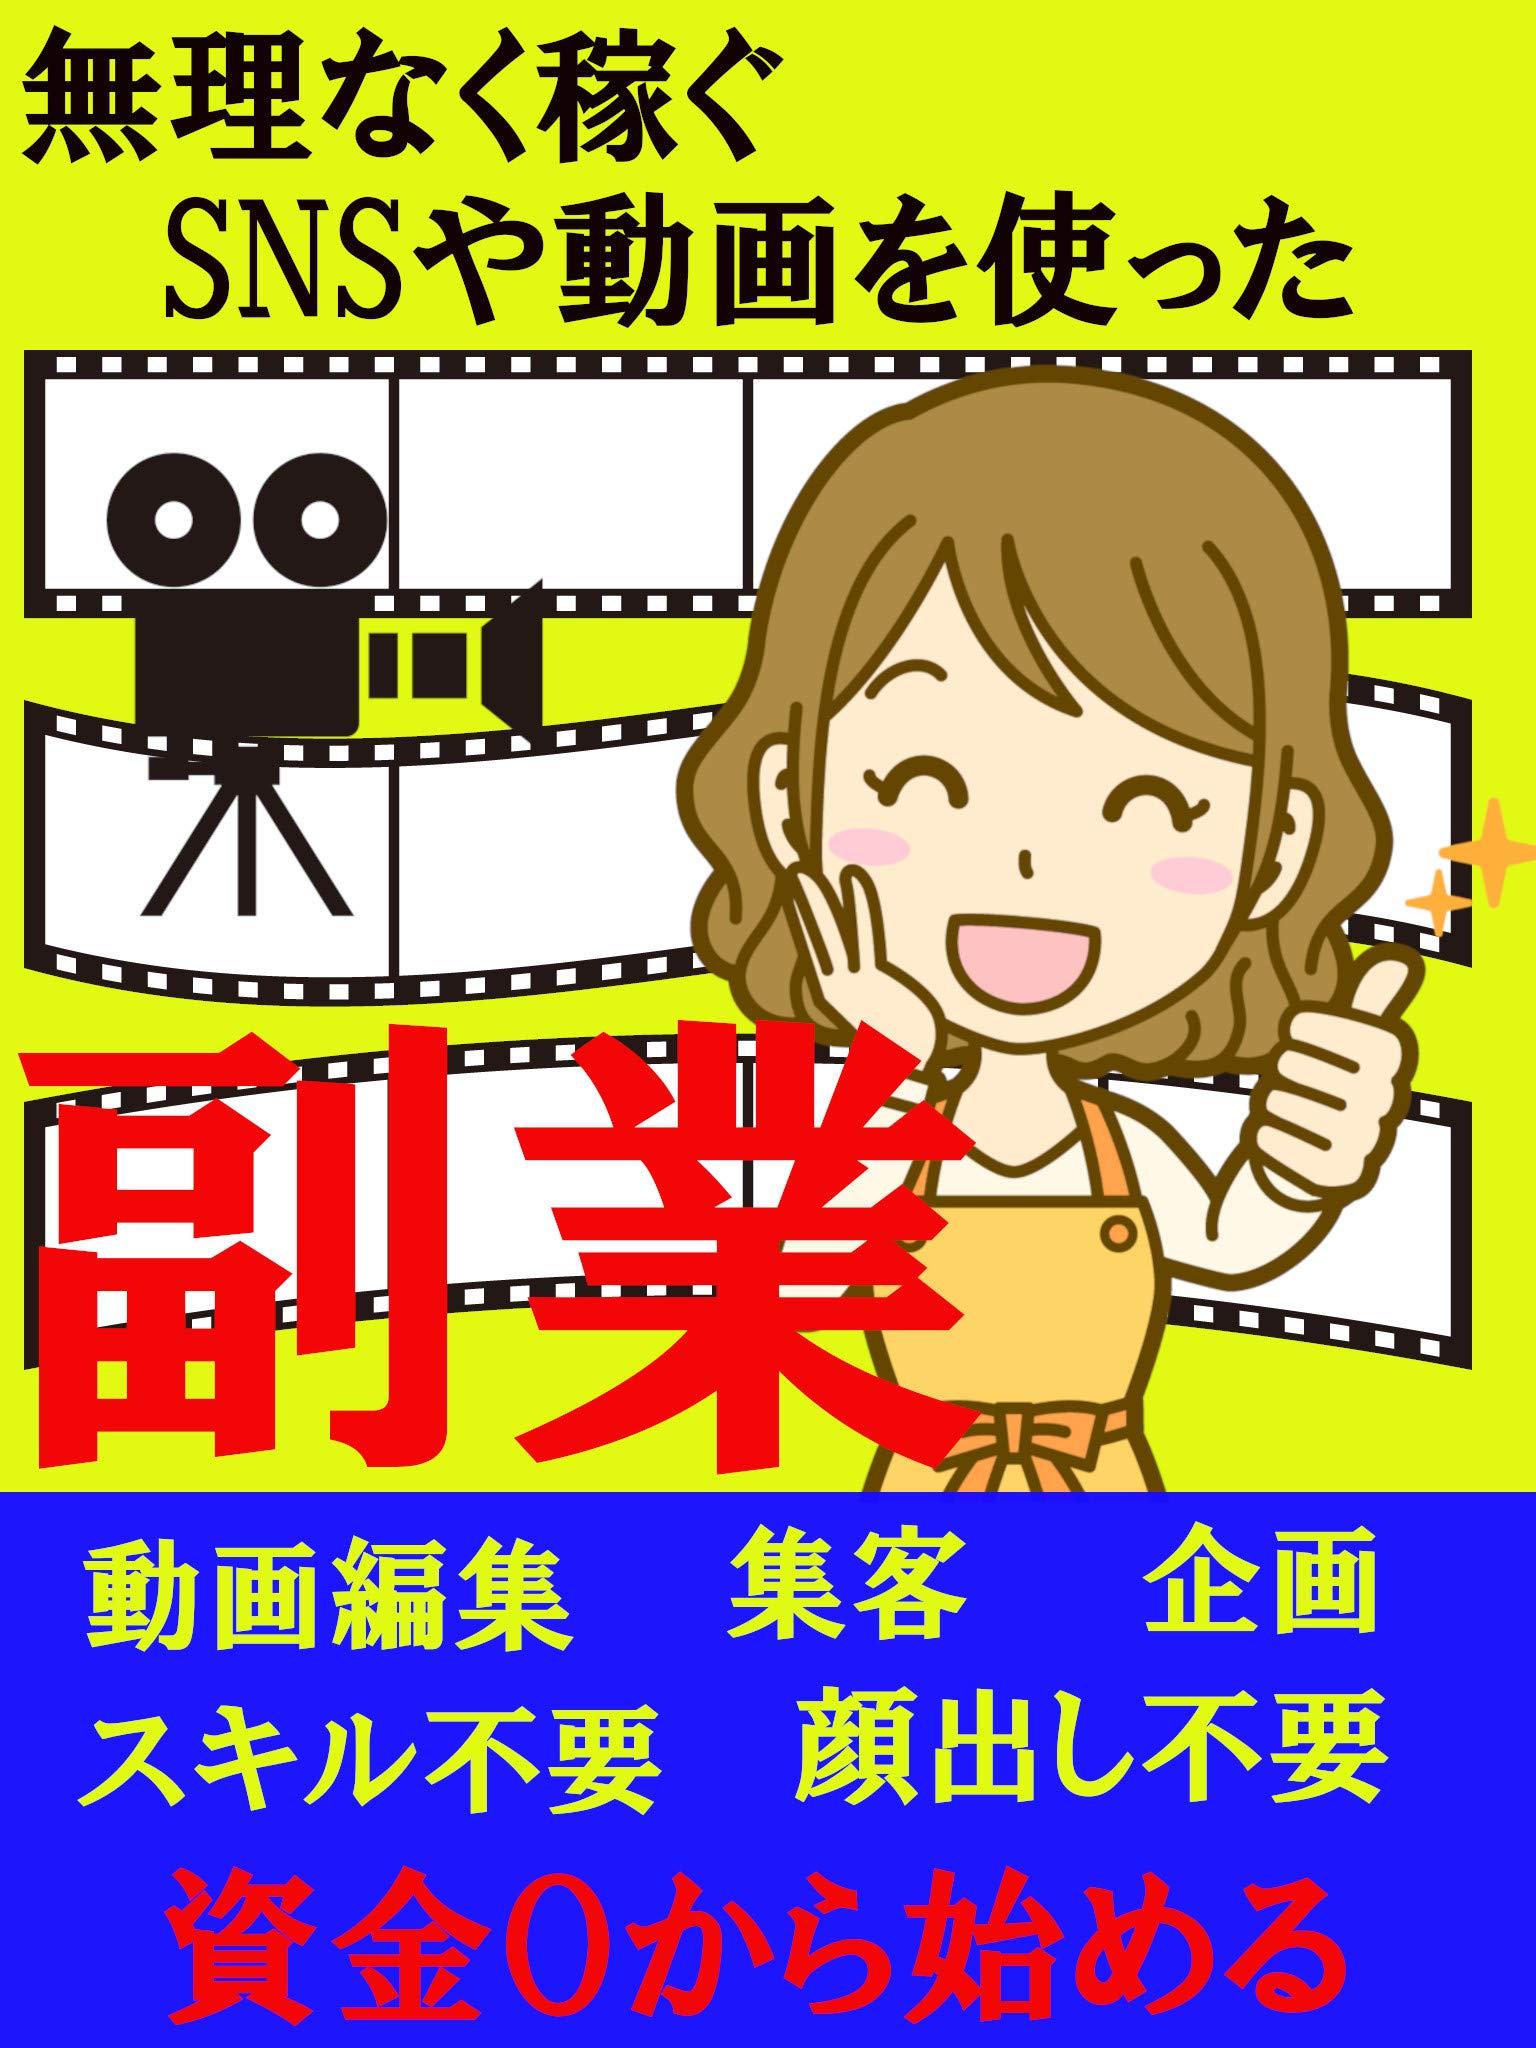 murinakukaseguSNSyadougawotukattafukugyoufukugyouSNSkasegu (Japanese Edition)